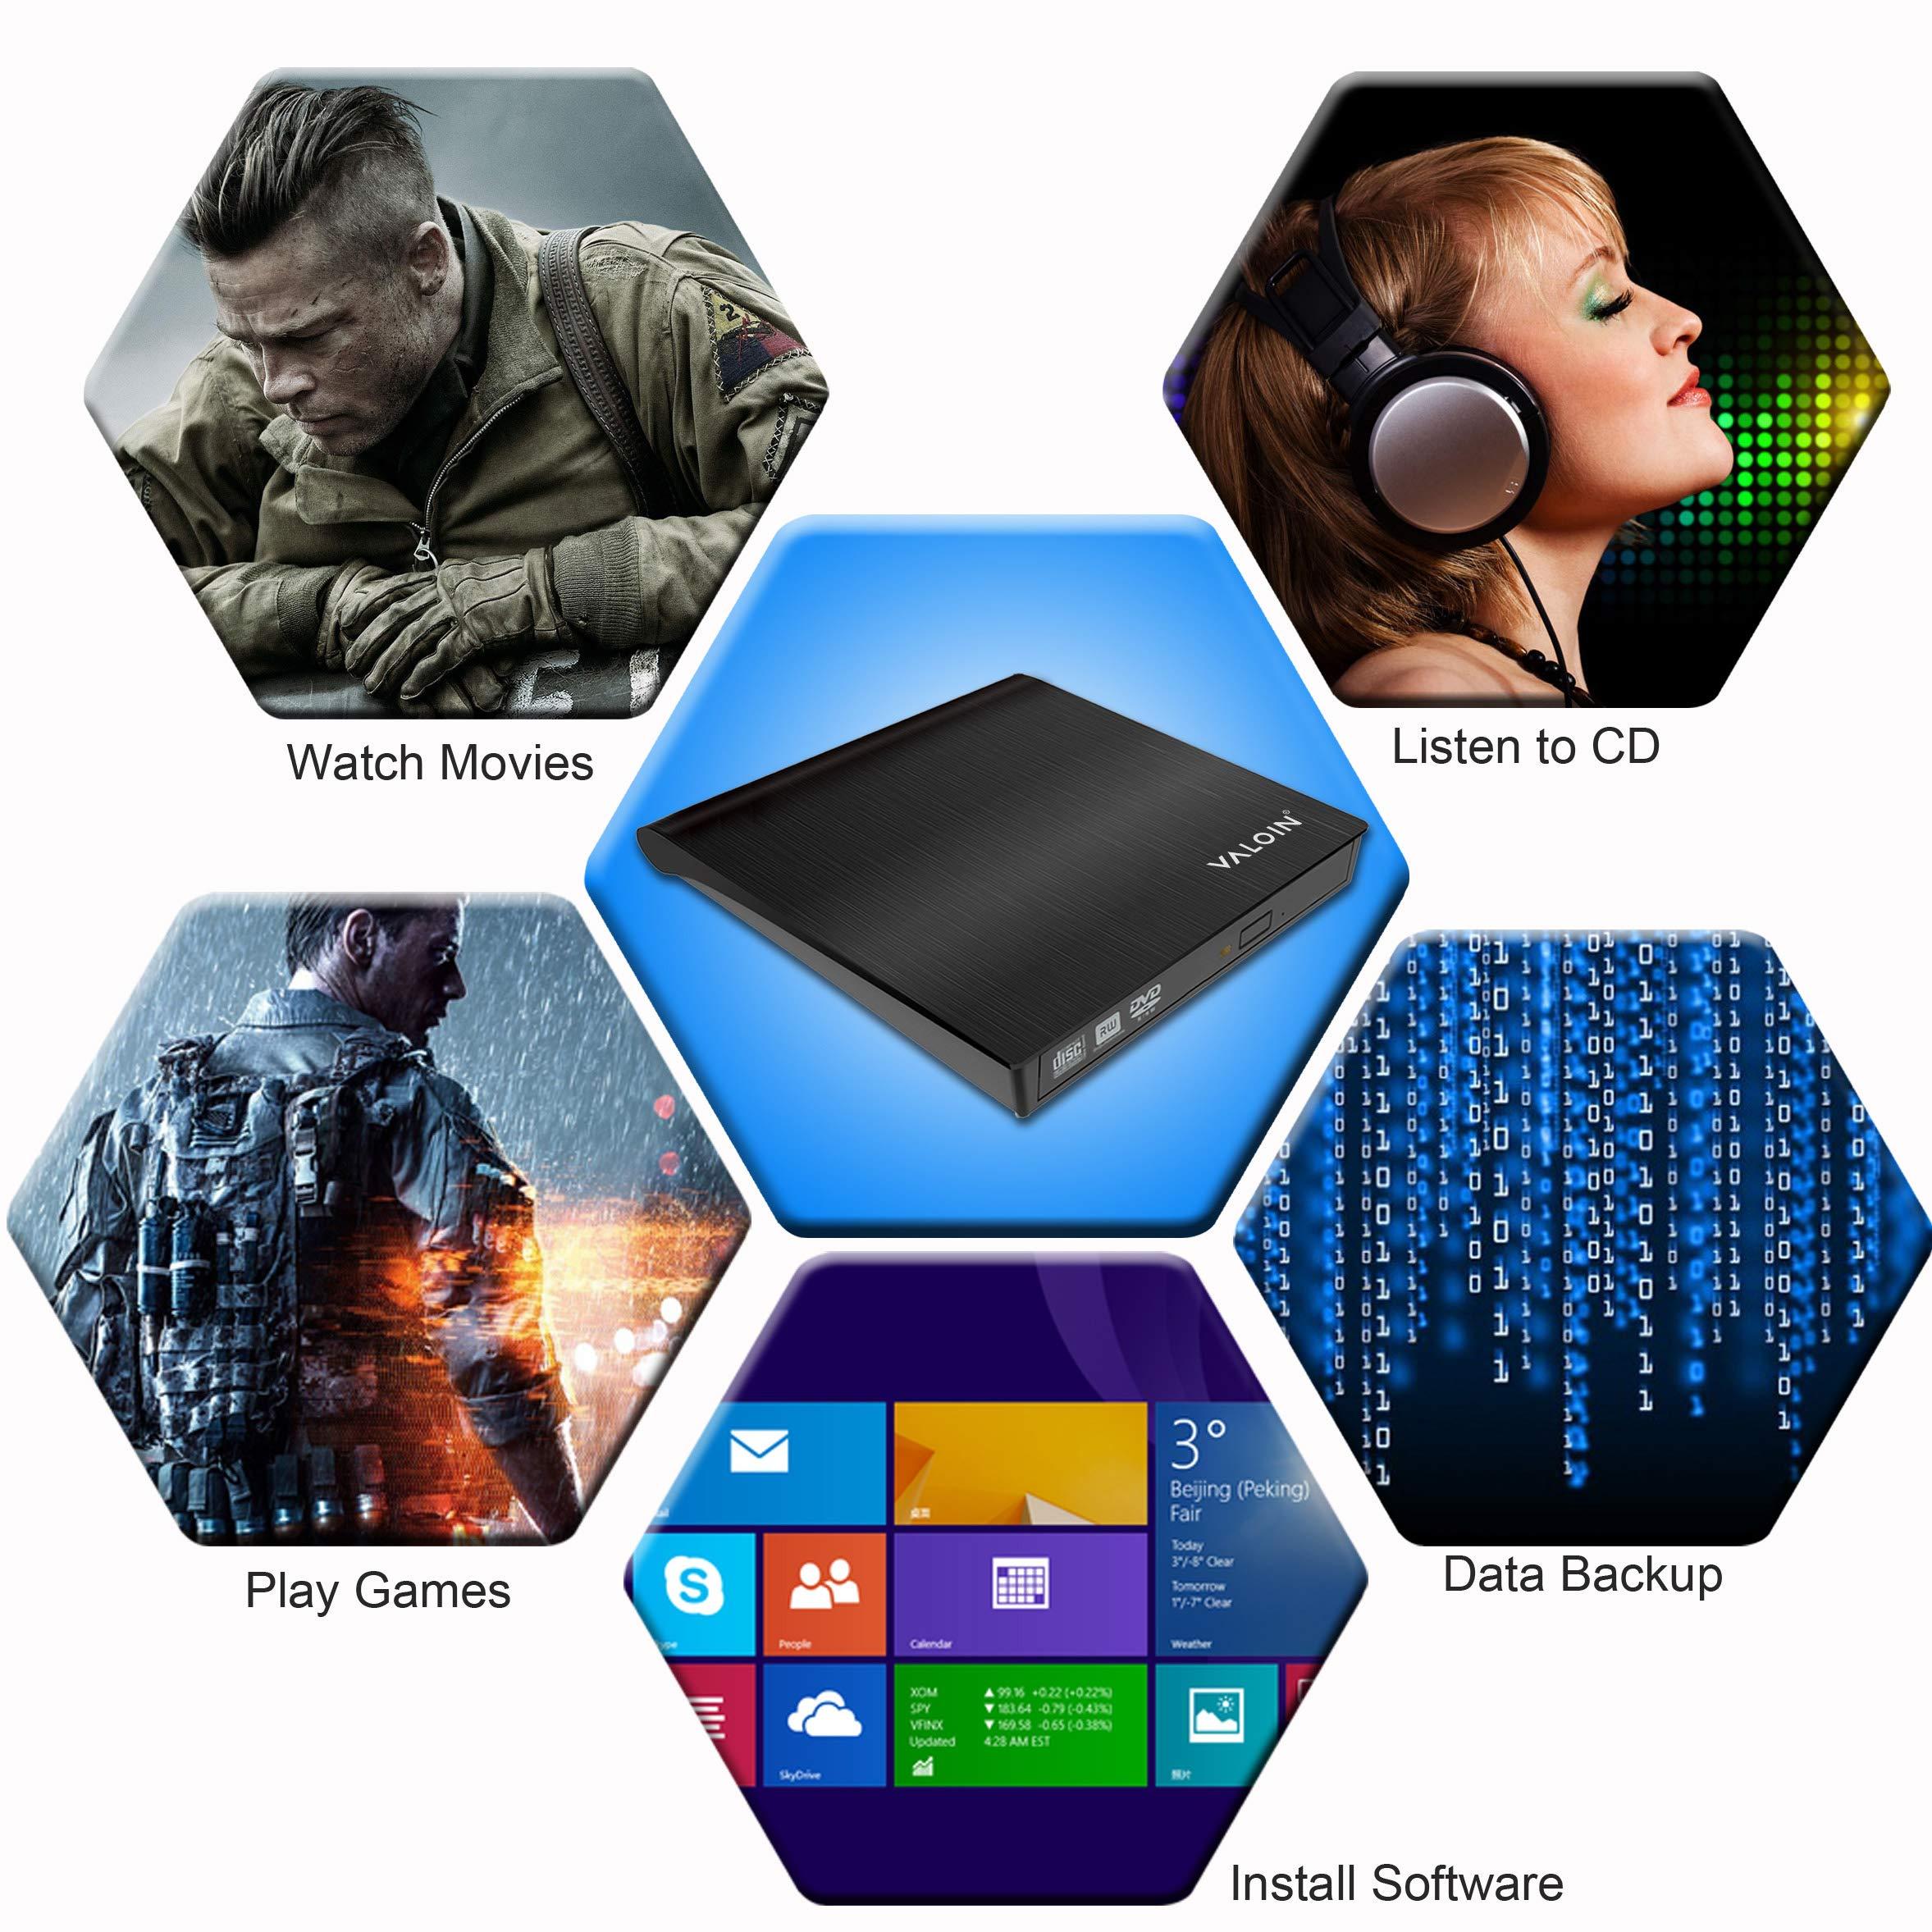 [2019 New Version]External DVD Drive,USB 3.0 Portable Ultra-Slim CD-RW ROM Drive Player Burner Writer Rewriter,Plug and Play by Valoin (Image #6)